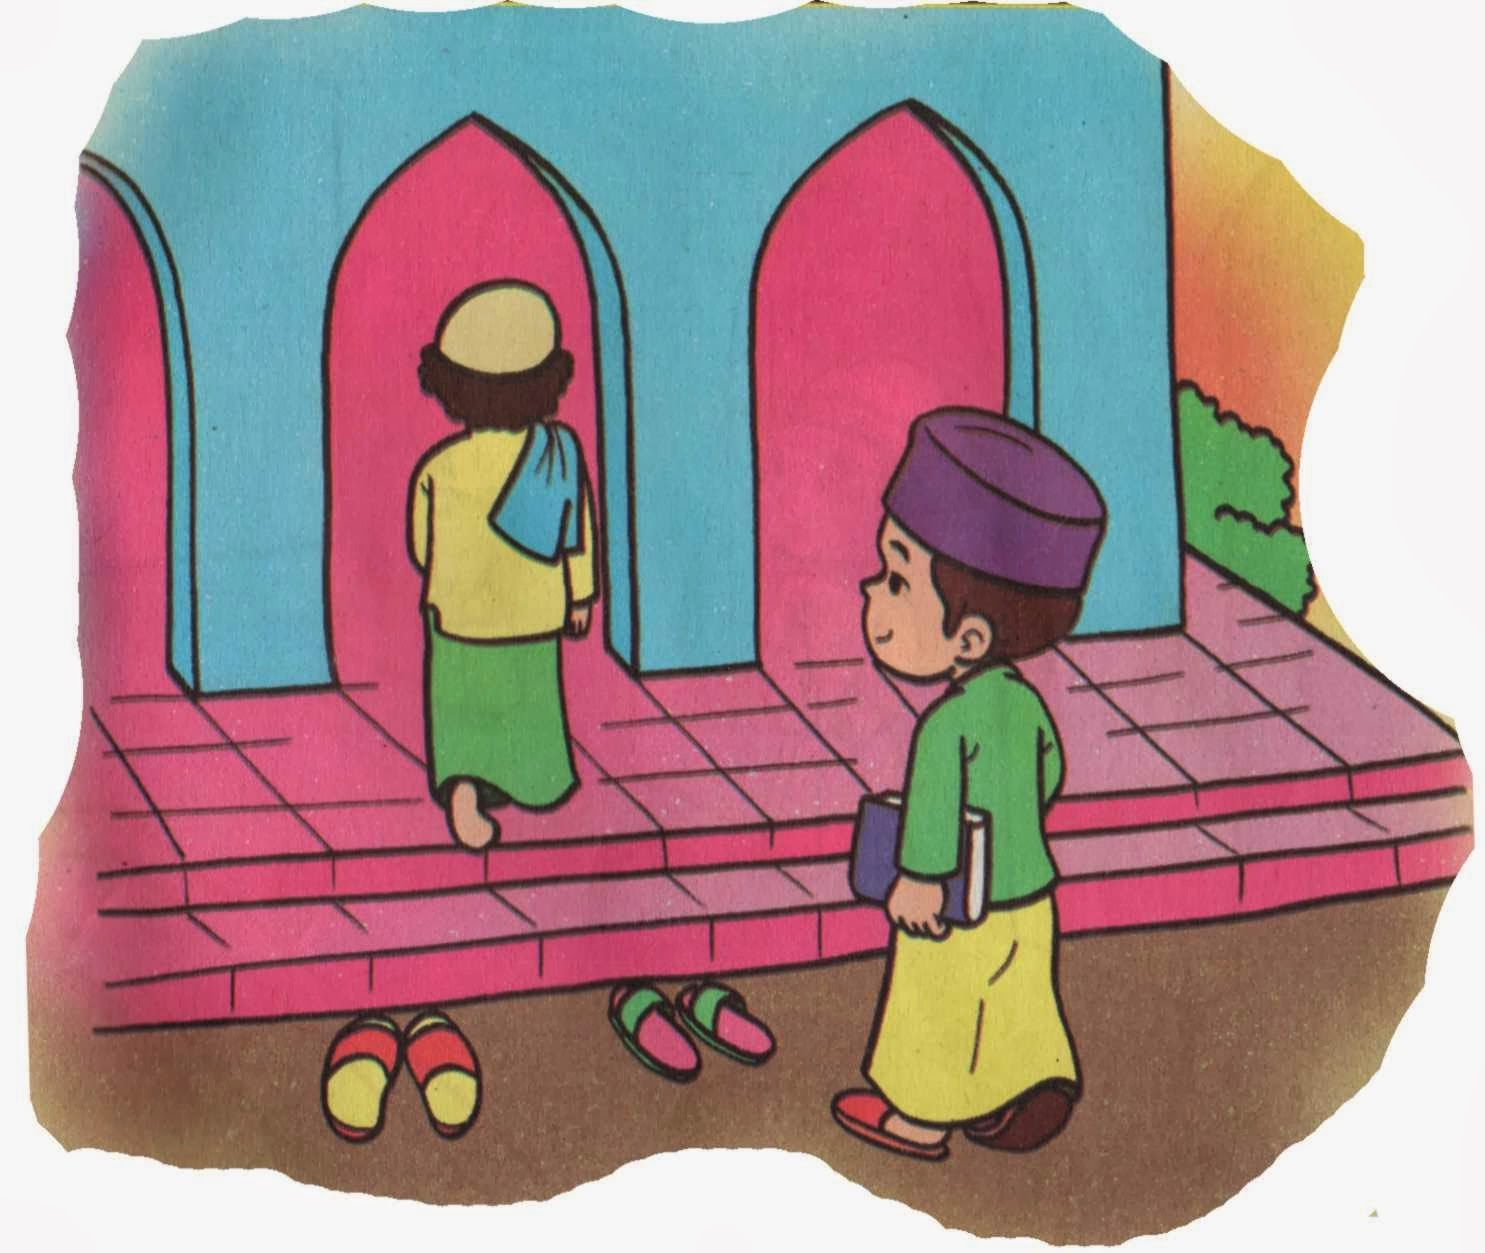 Hasil gambar untuk gambar tentang orang berdoa masuk masjid